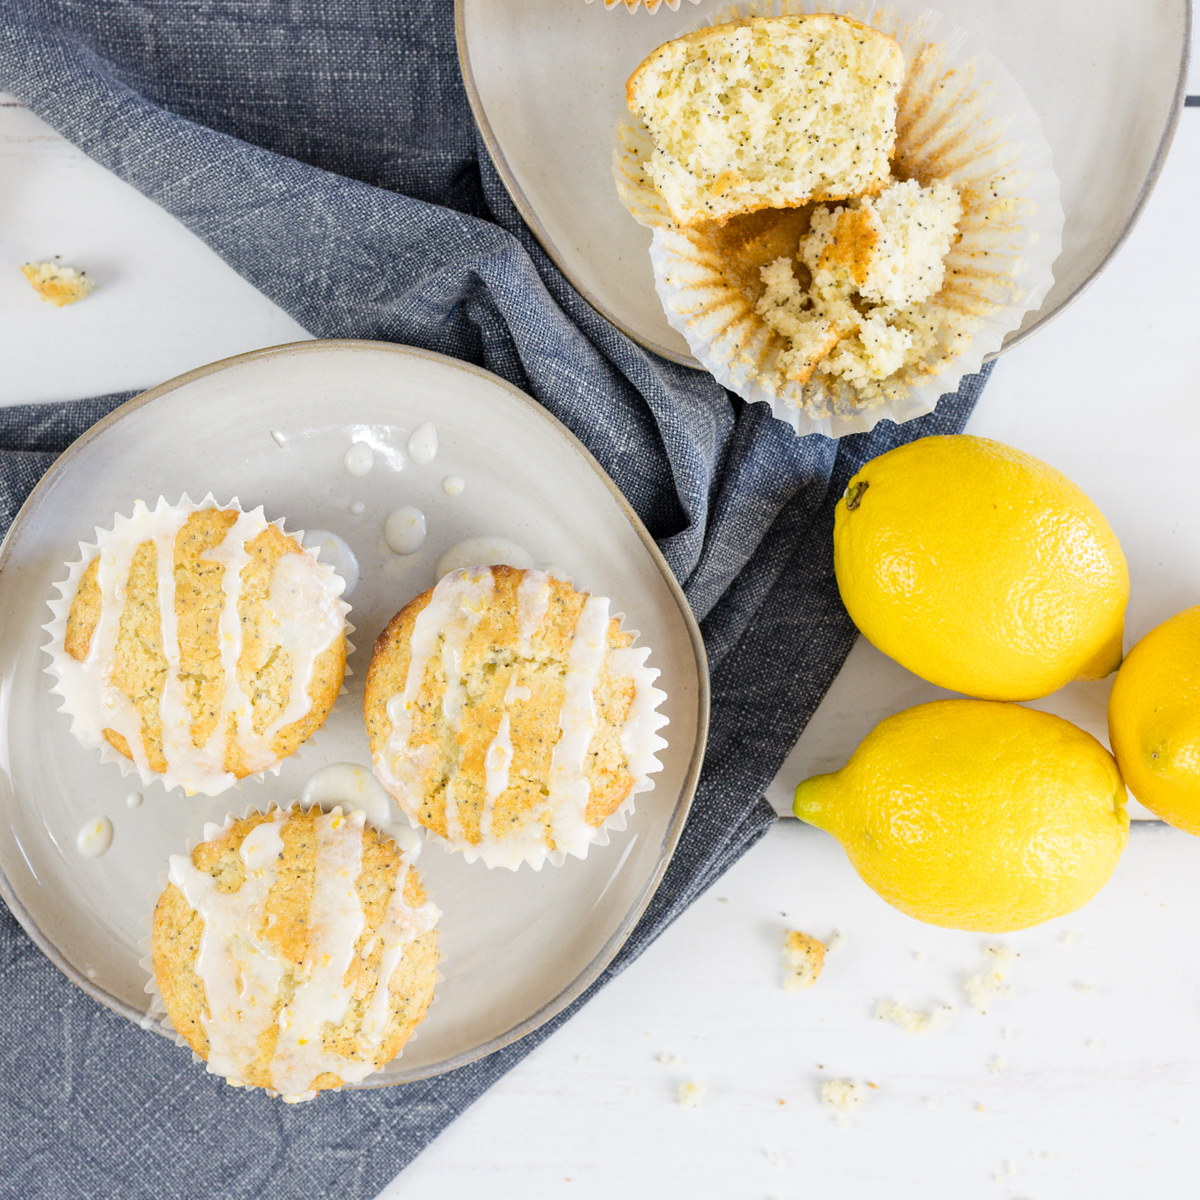 Zesty Lemon Poppy Seed Muffins